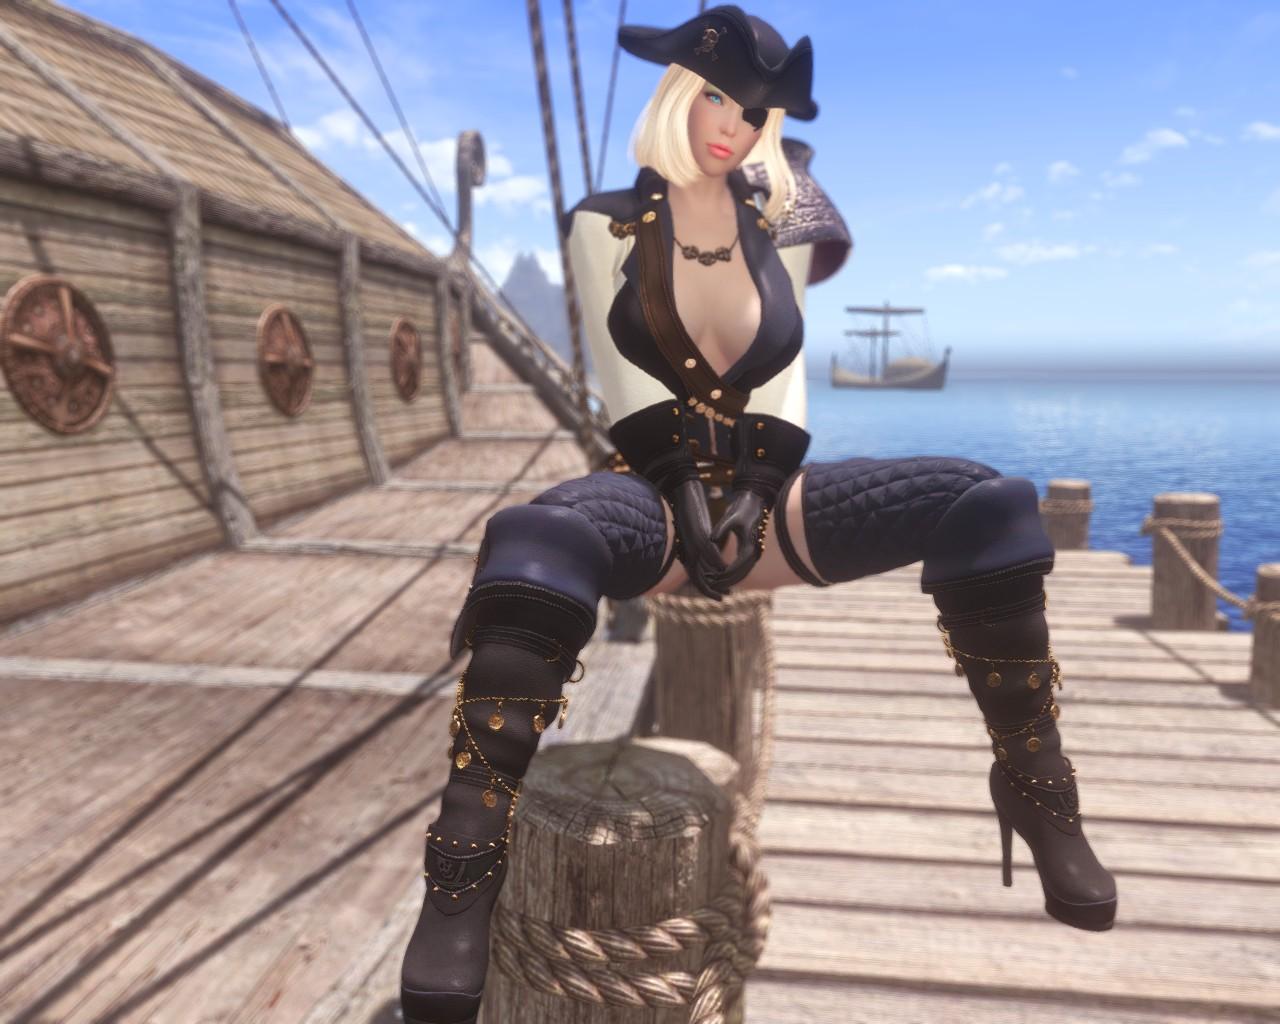 H2135's Pirate Series1 00.jpg